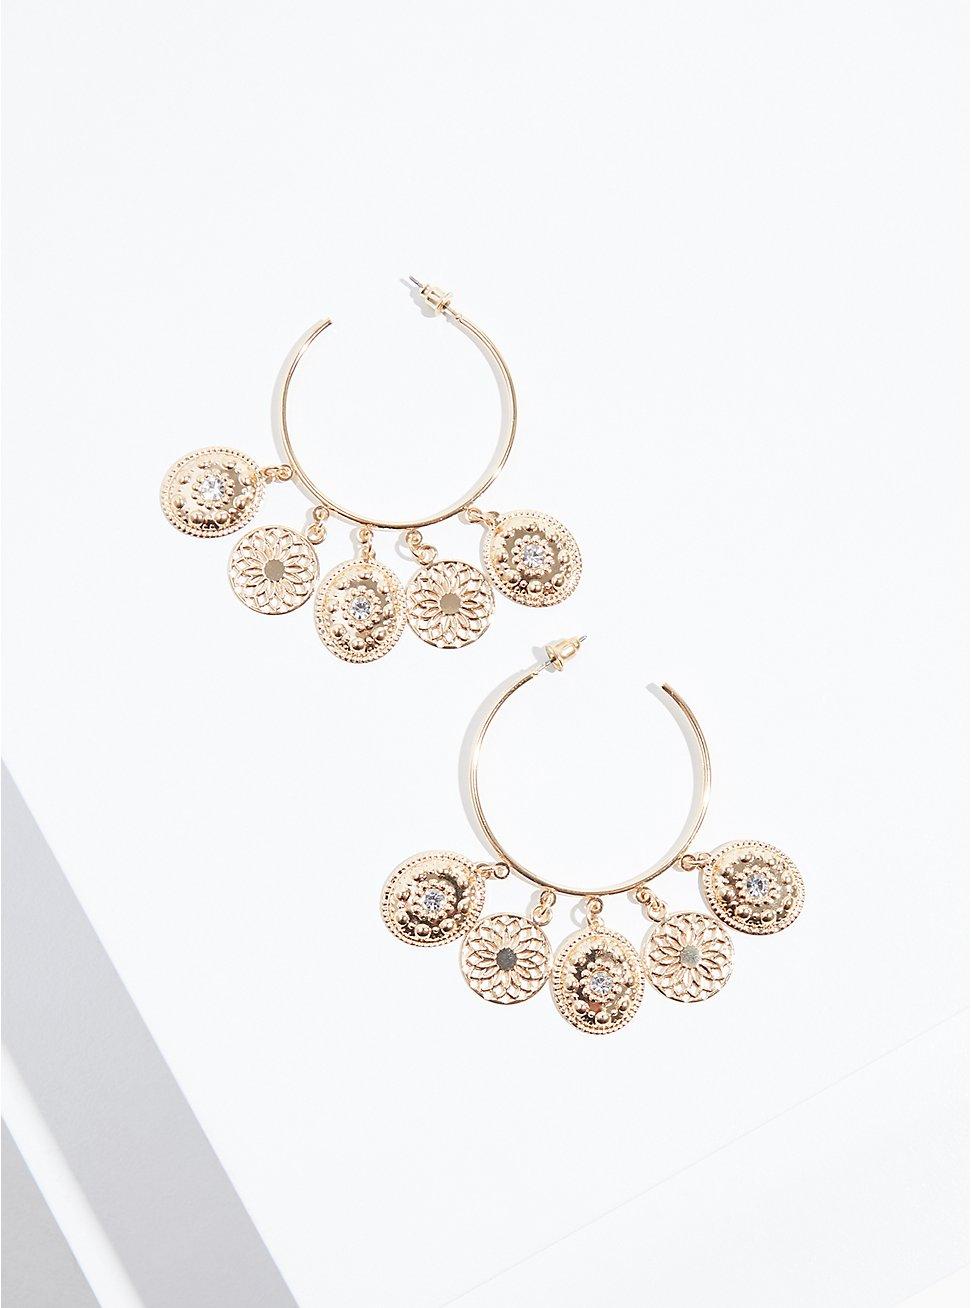 Gold-Tone Dangle Hoop Statement Earrings, , hi-res